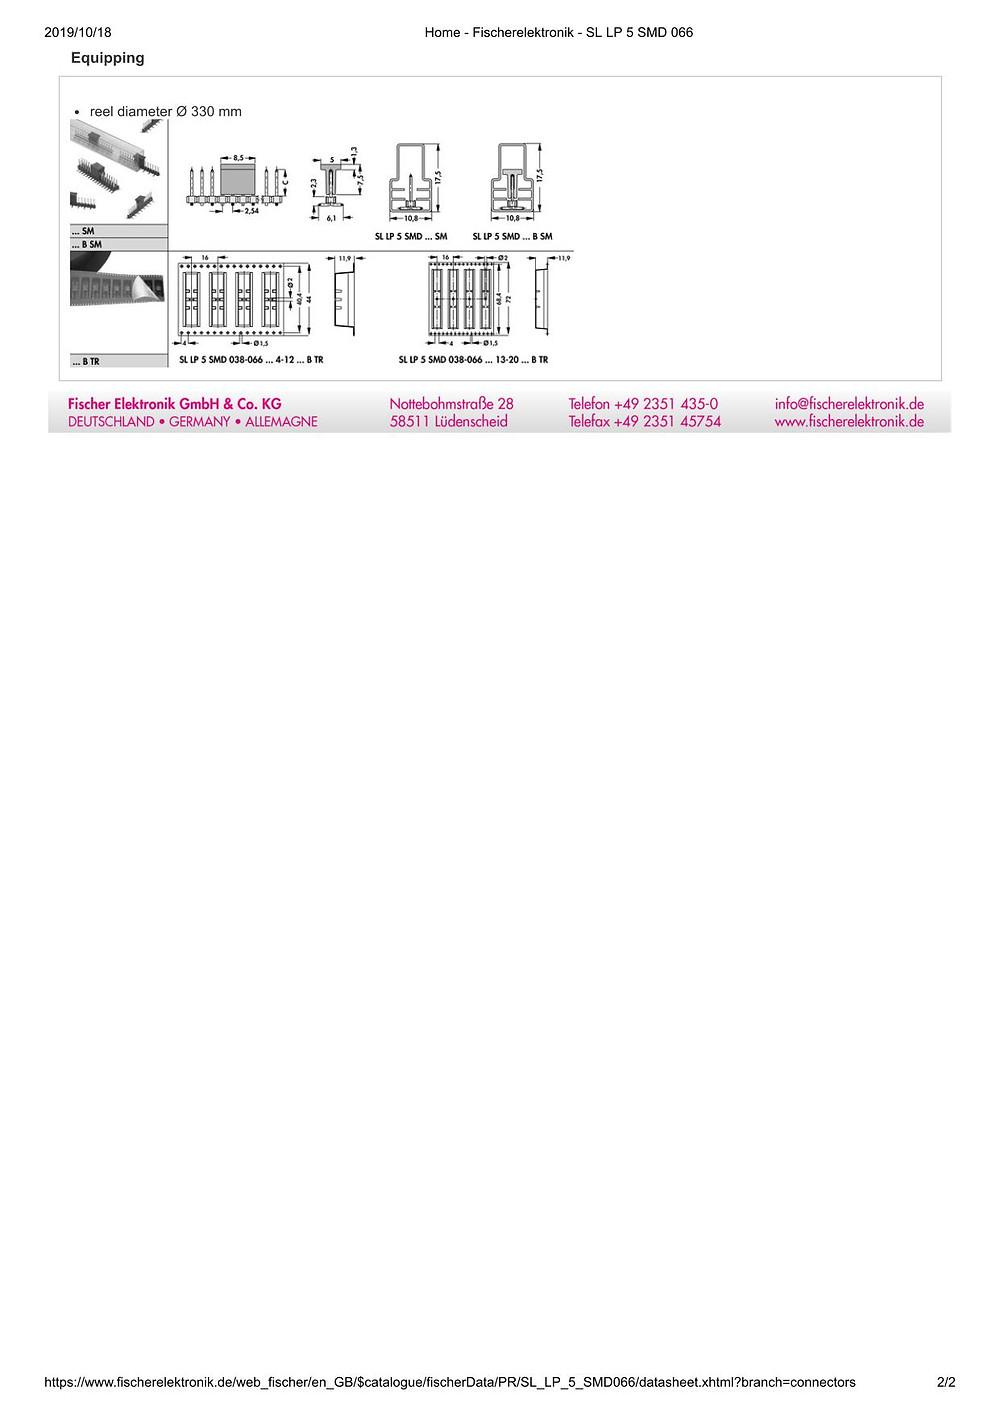 SL LP 5 SMD 066 フィッシャー テープ&リール対応 低背型 ピンヘッダ  2.54㎜ピッチ □0.635mm (1リール=250個巻)4-20ピン